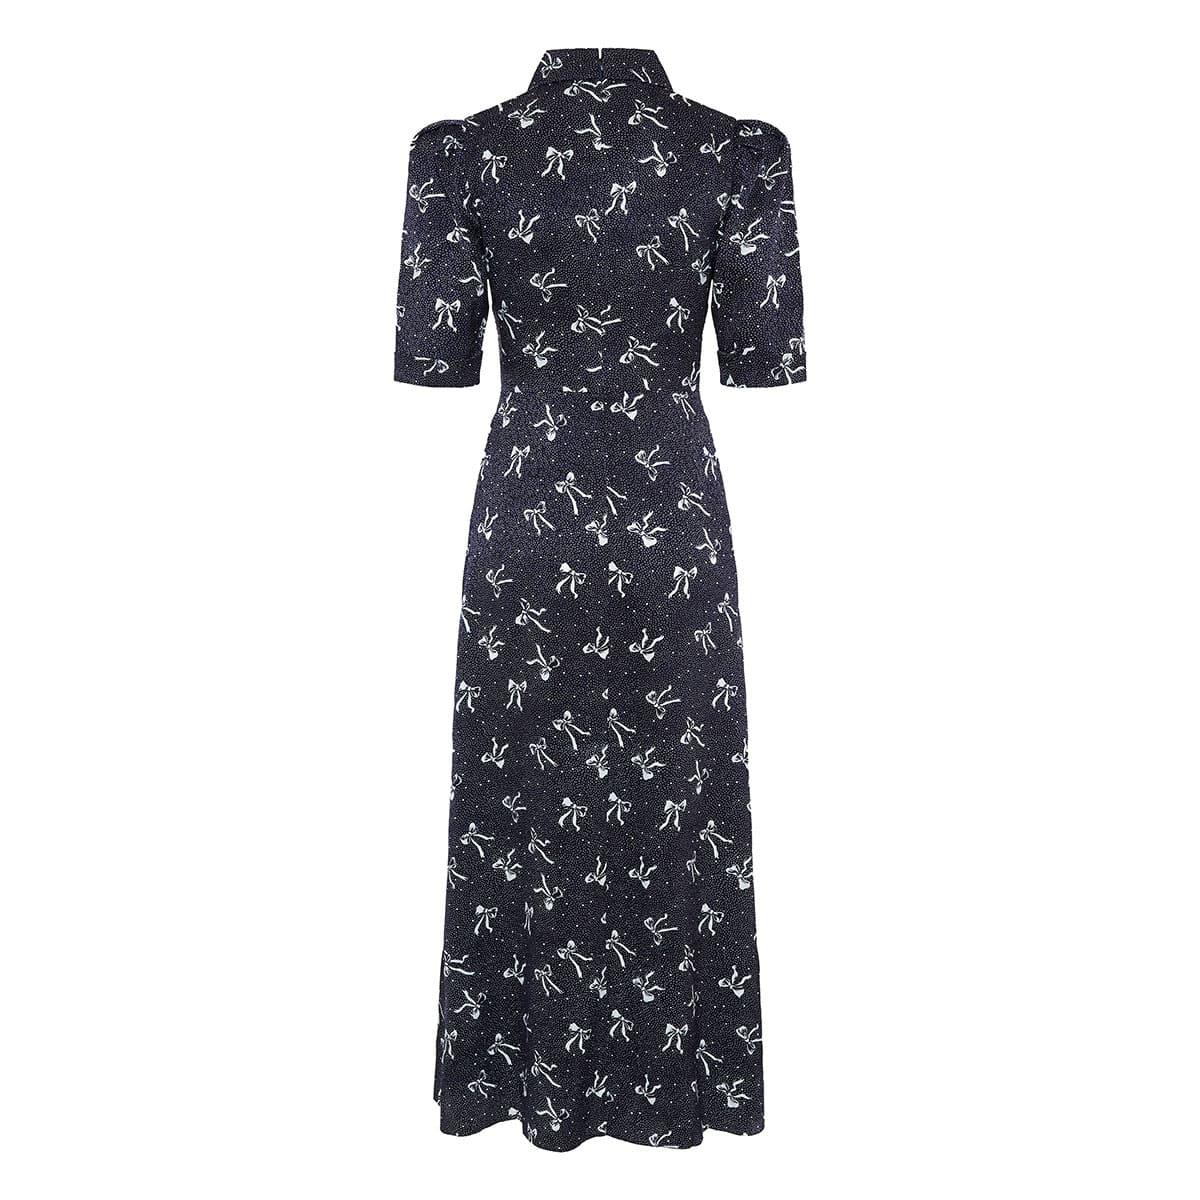 Bow-printed jacquard midi dress